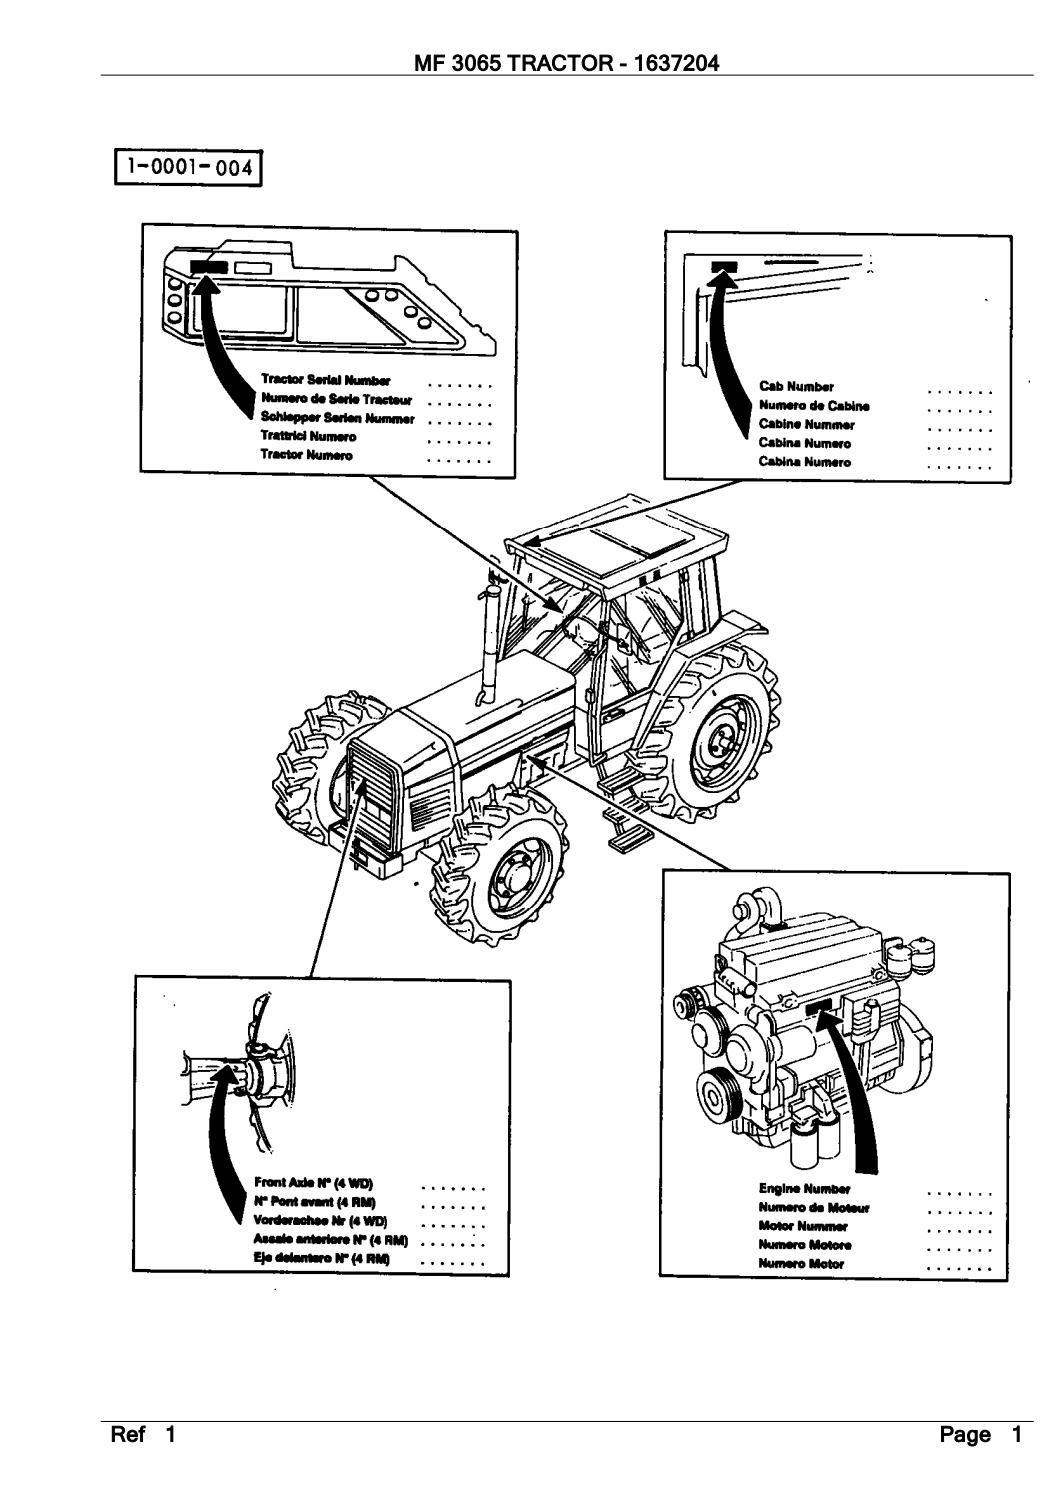 Massey Ferguson MF 3065 TRACTOR Service Parts Catalogue